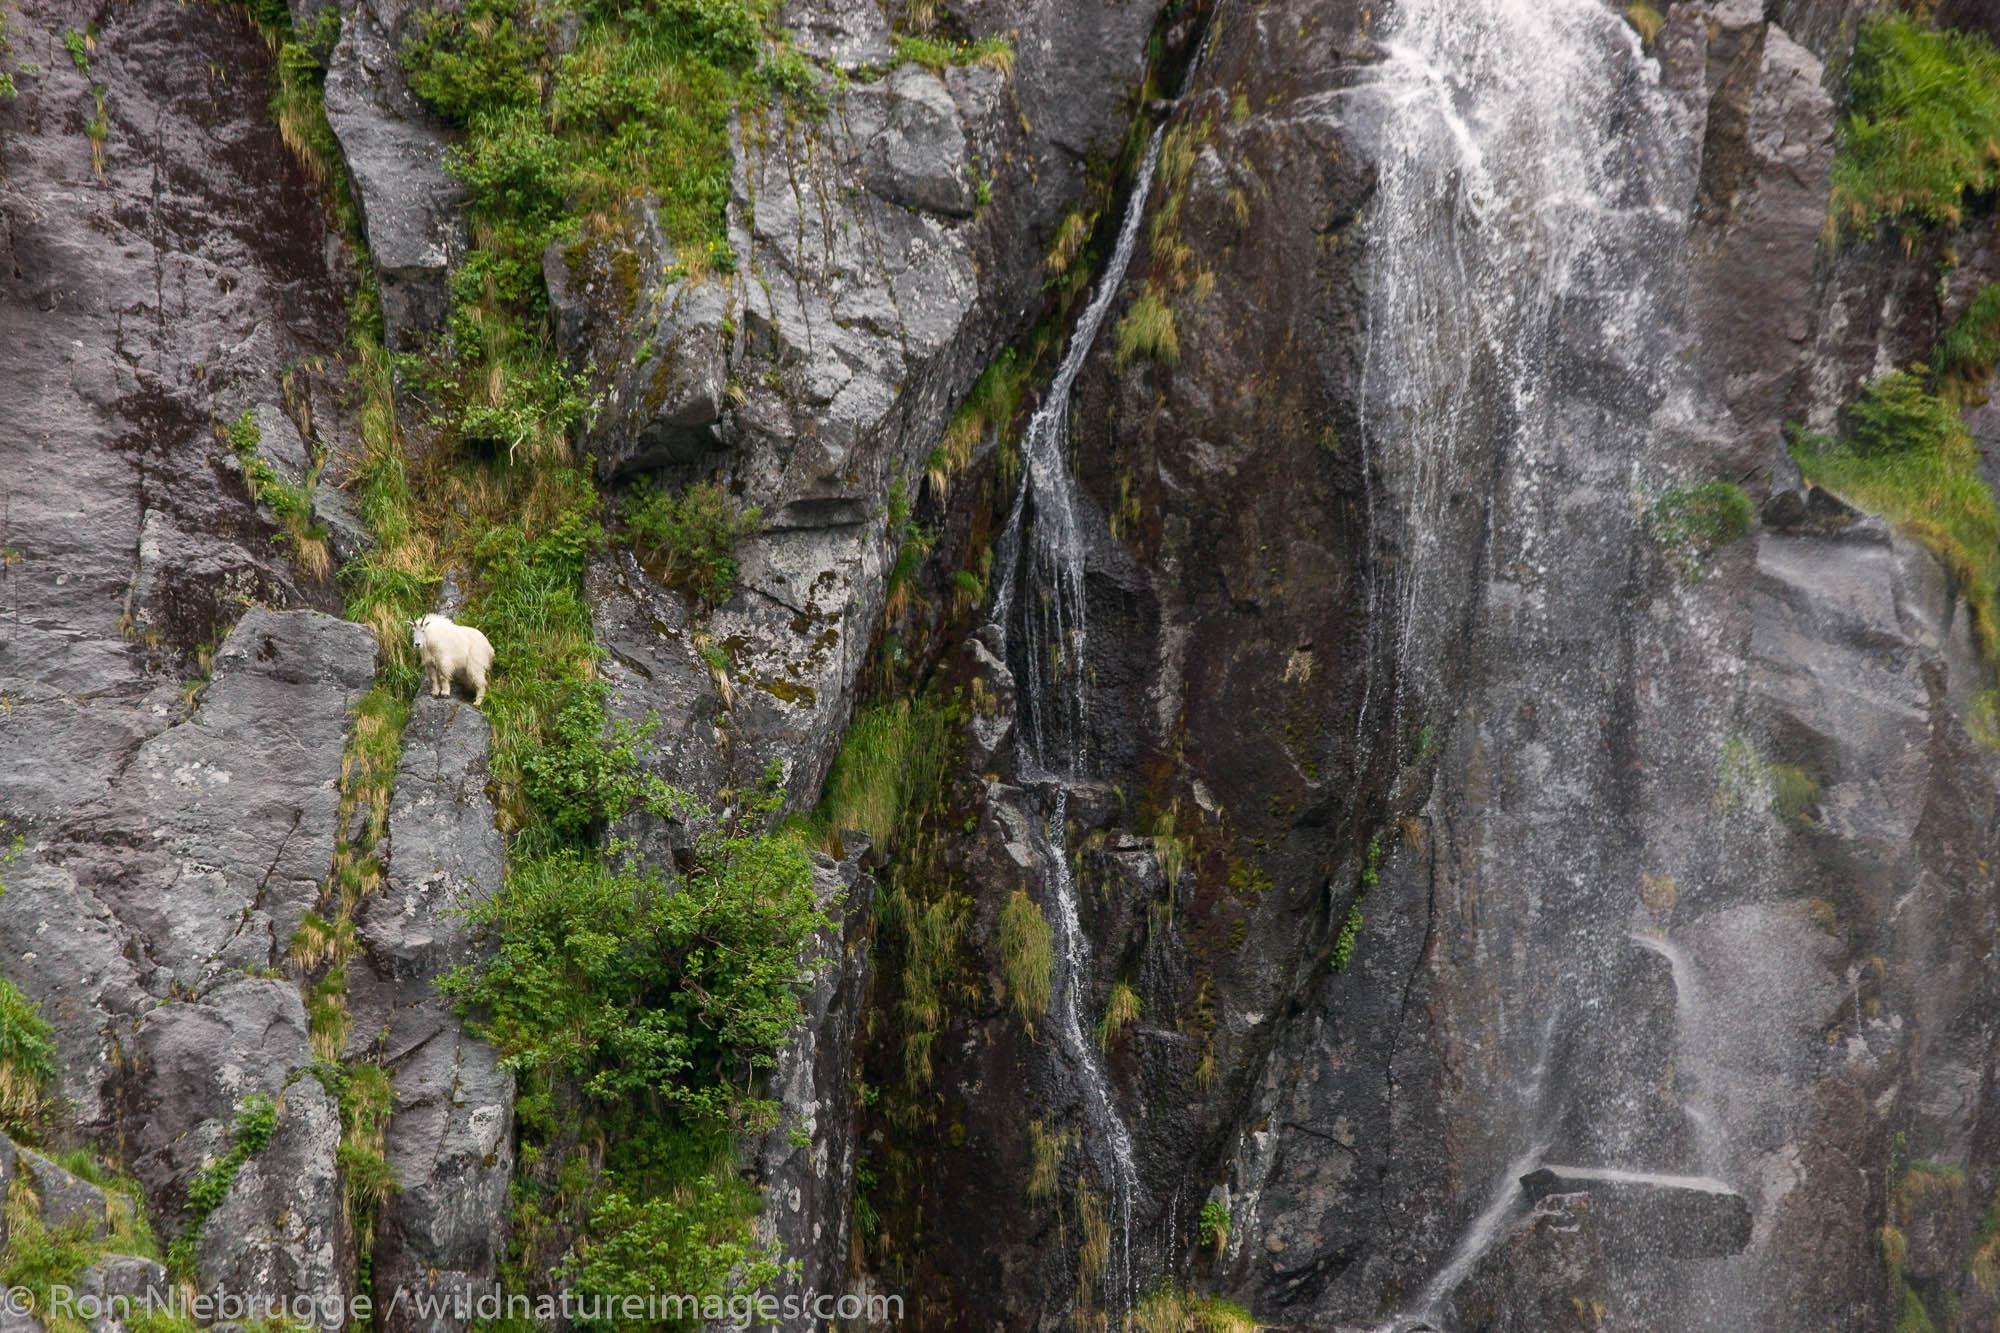 Mountain Goat in Cataract Cove, Harris Bay, Kenai Fjords National Park, Alaska.